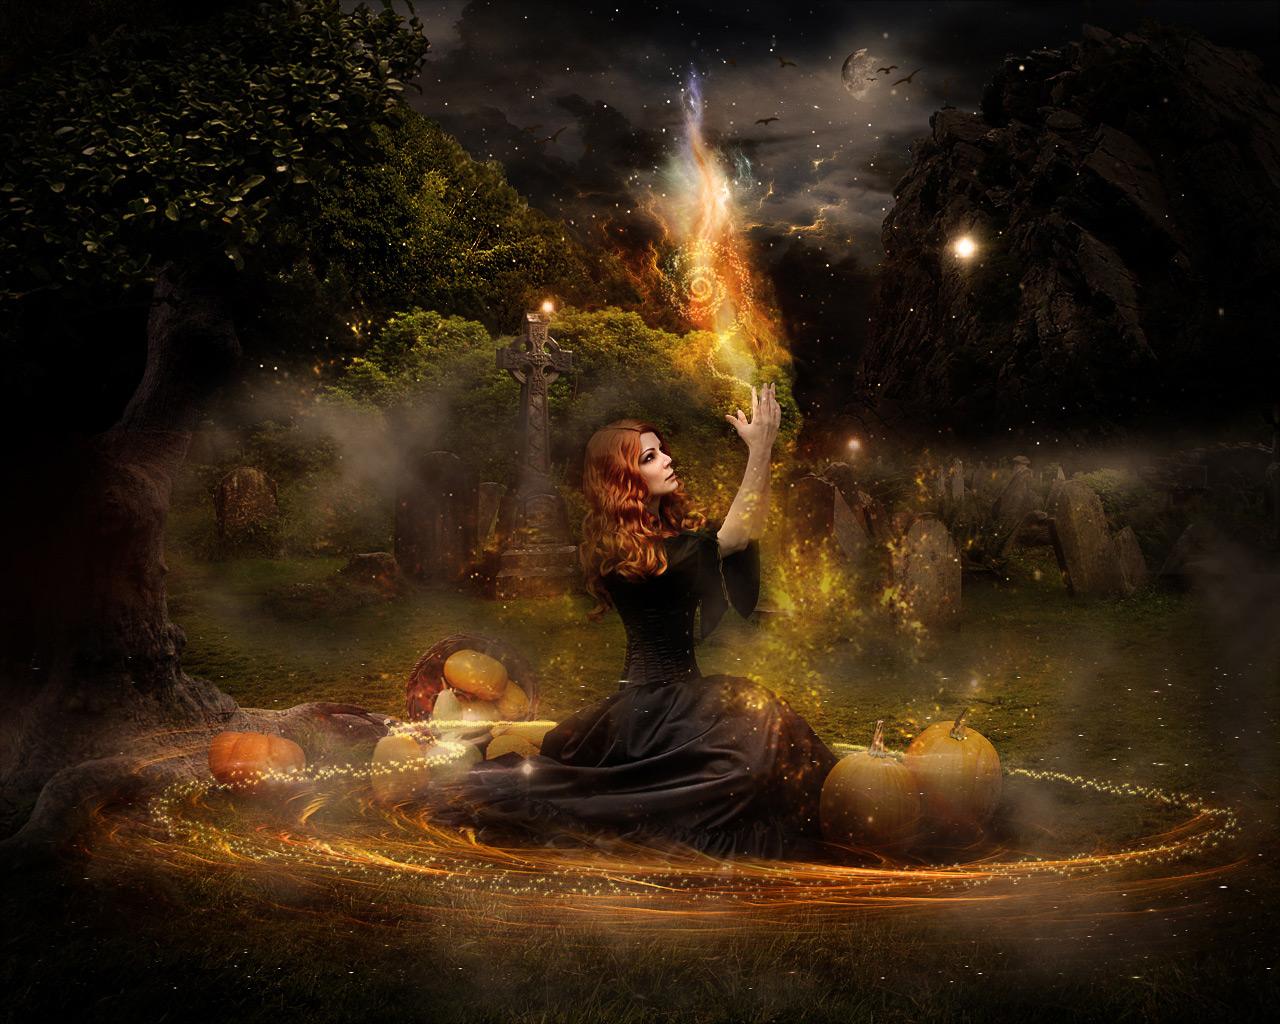 Witchcraft Trials and Misogyny Essay